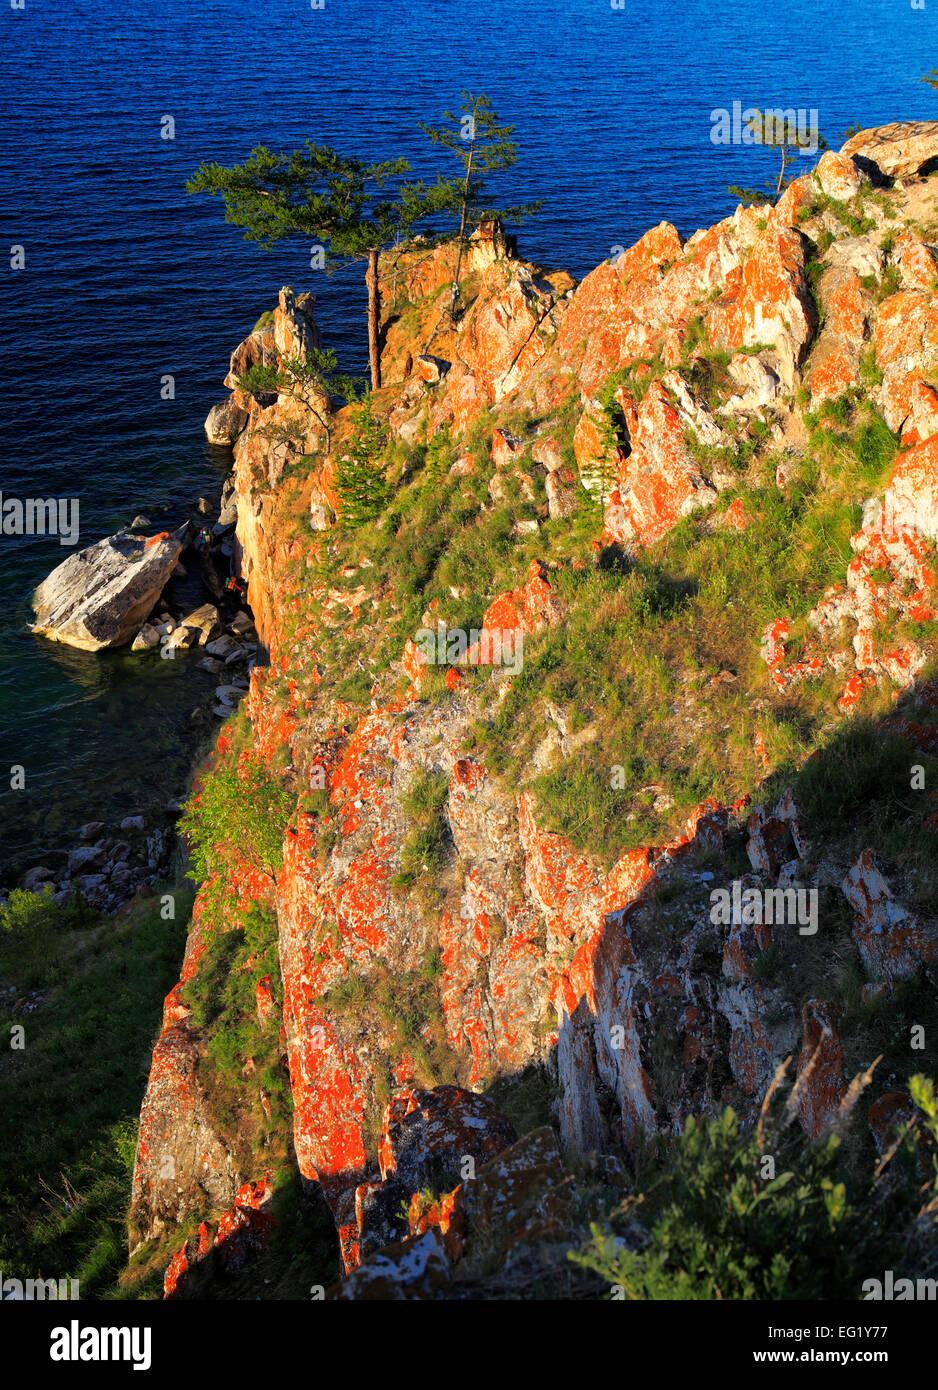 Olkhon island, landscape near Khuzhir, Baikal lake, Russia - Stock Image